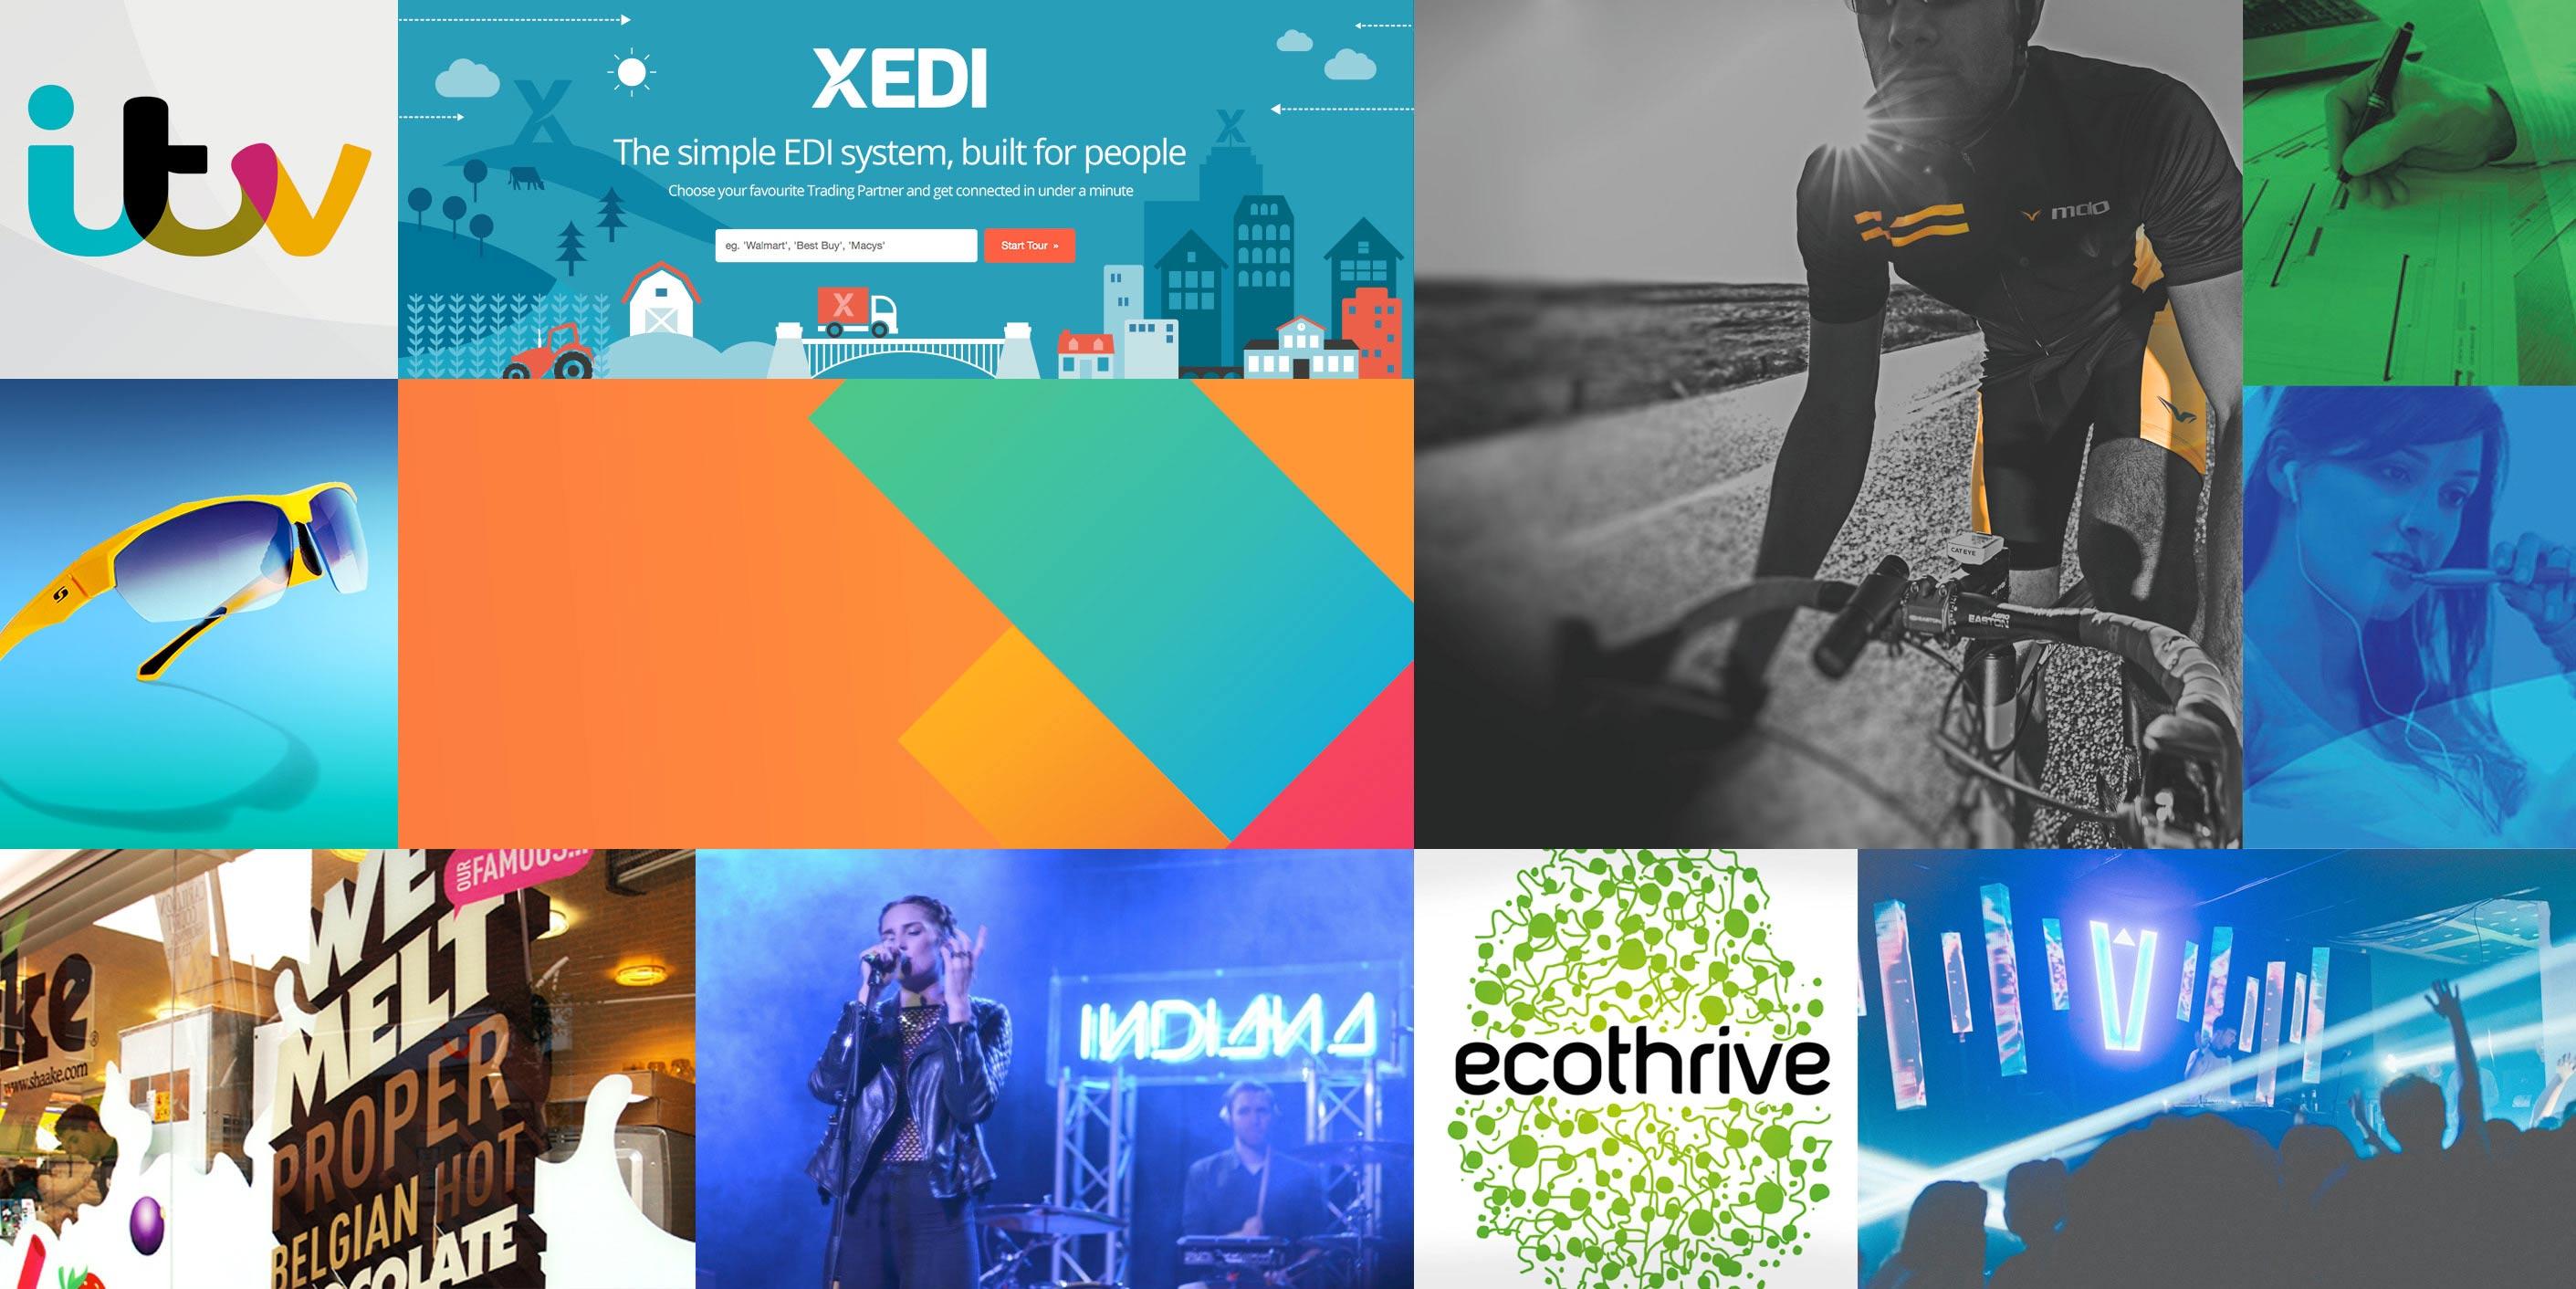 PARA Creative - We Create. We Innovate. We Communicate